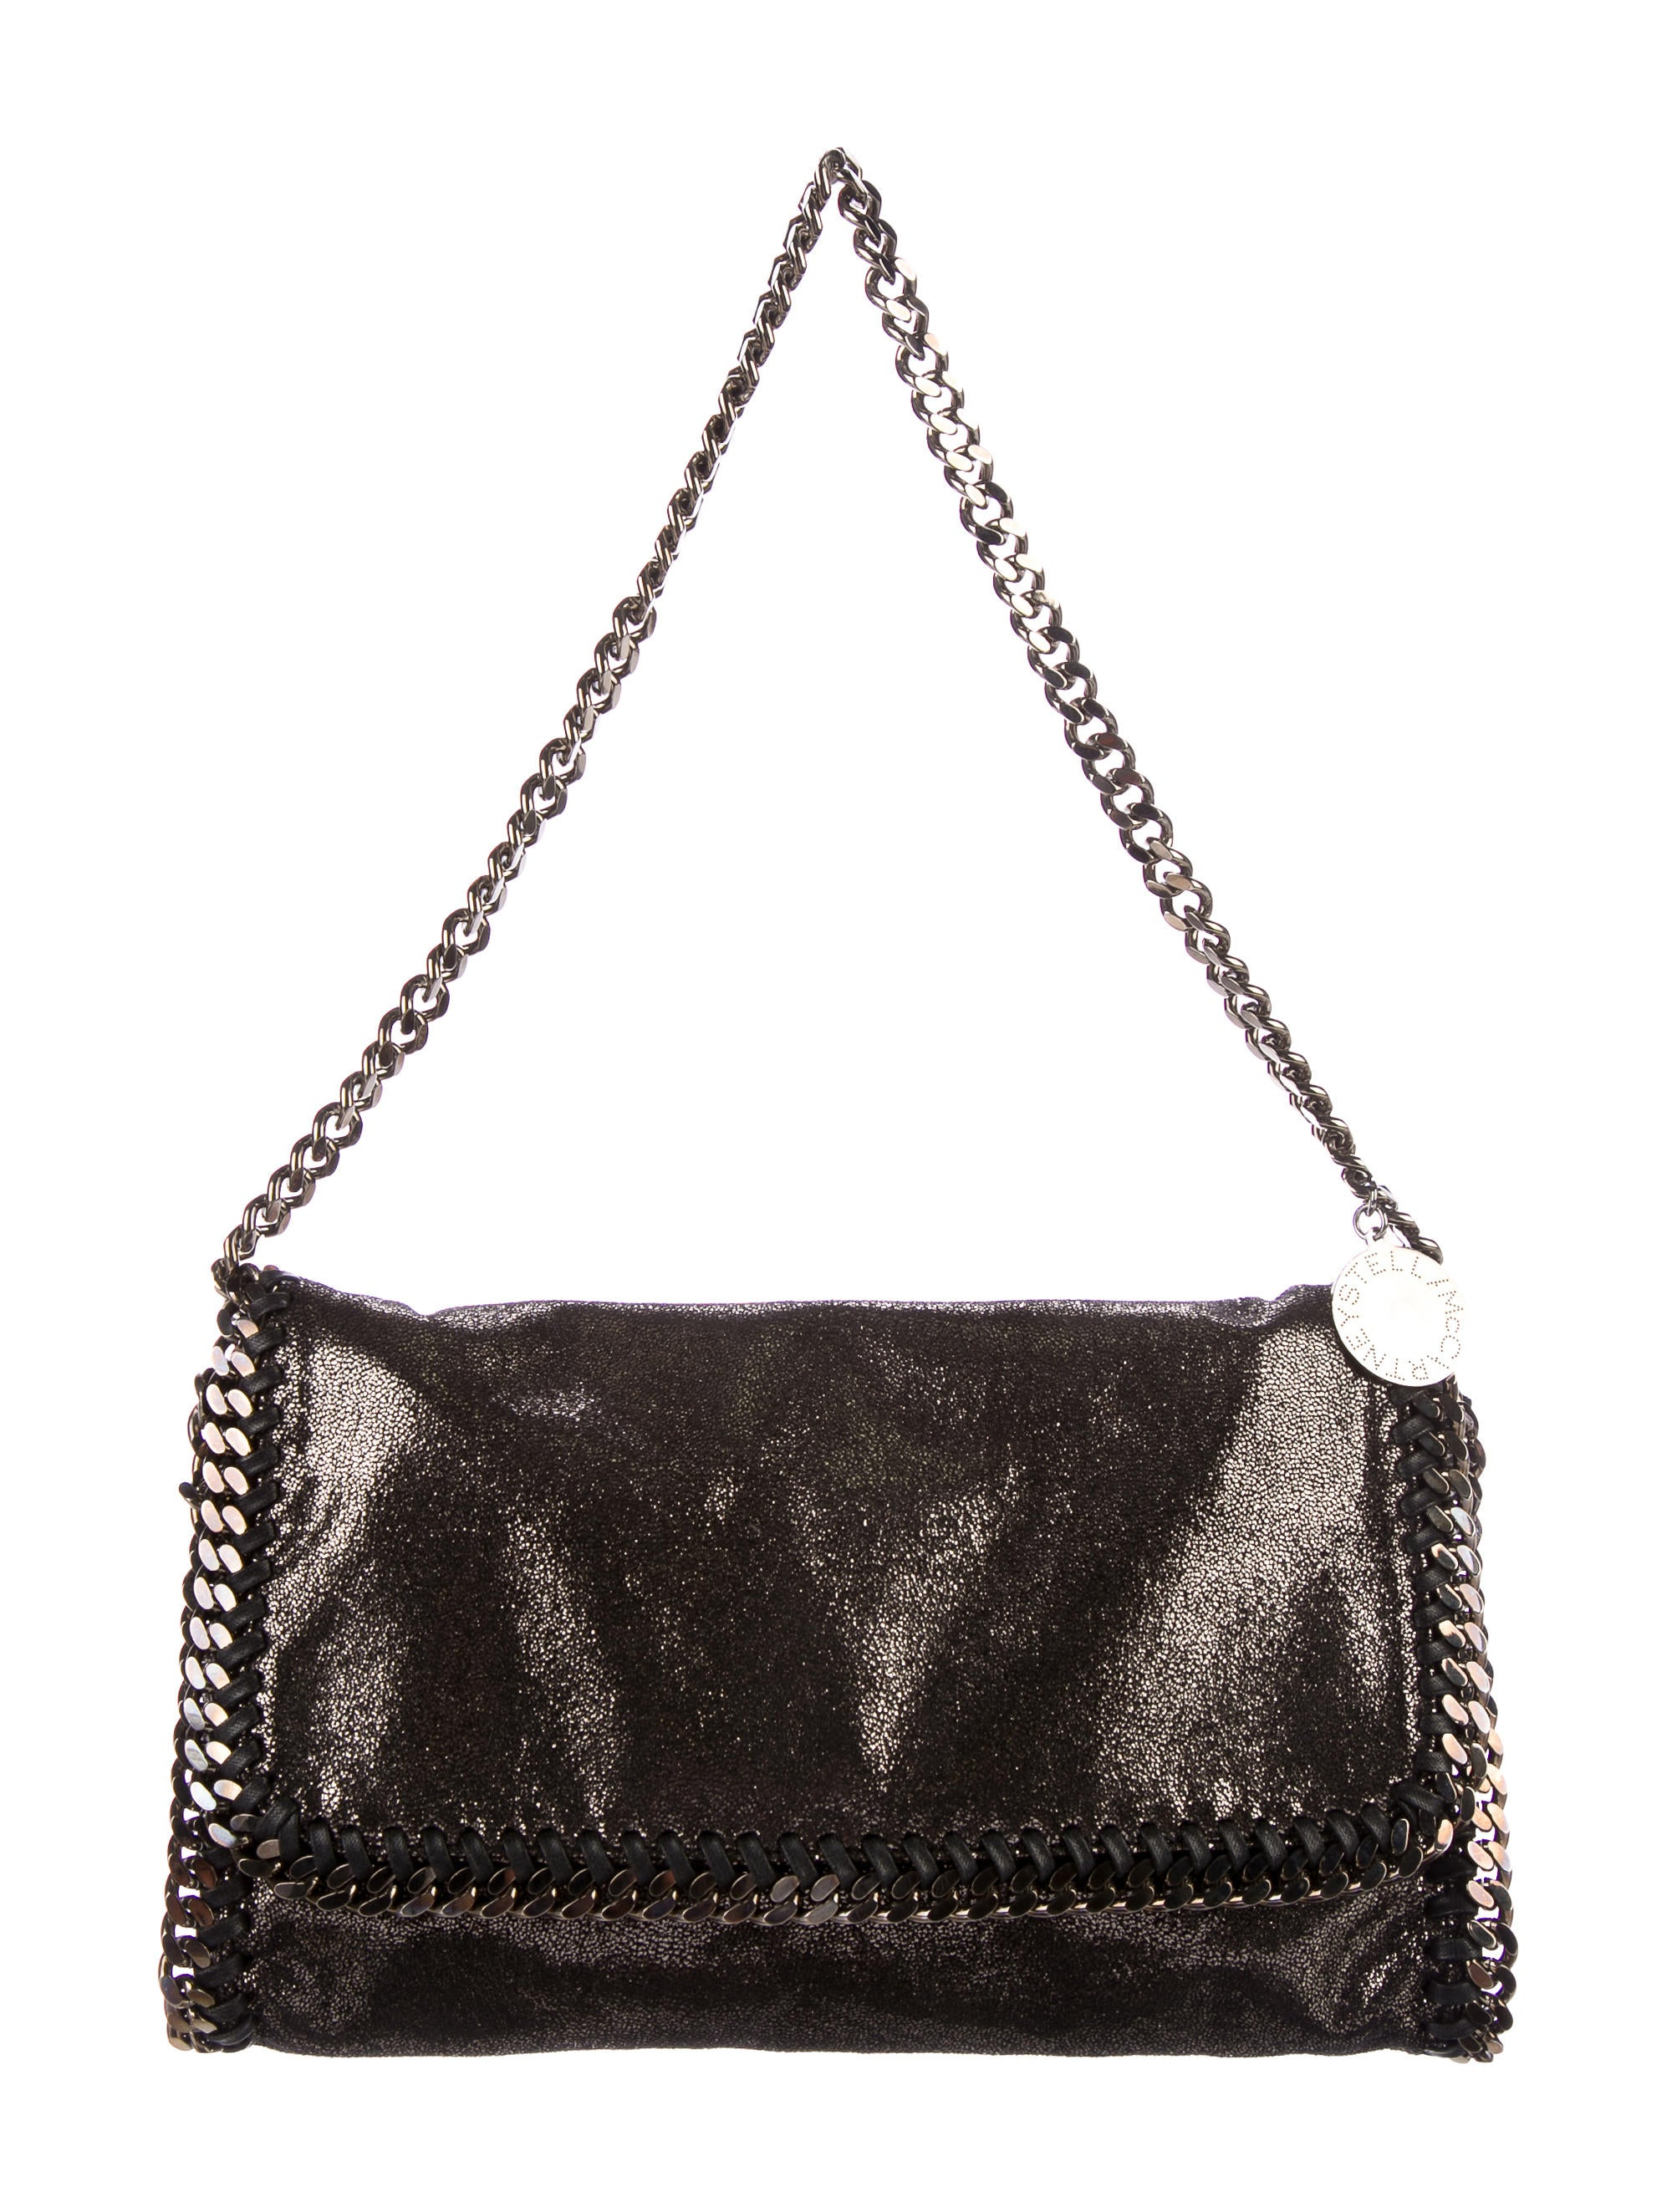 stella mccartney falabella shoulder bag handbags stl54945 the realreal. Black Bedroom Furniture Sets. Home Design Ideas